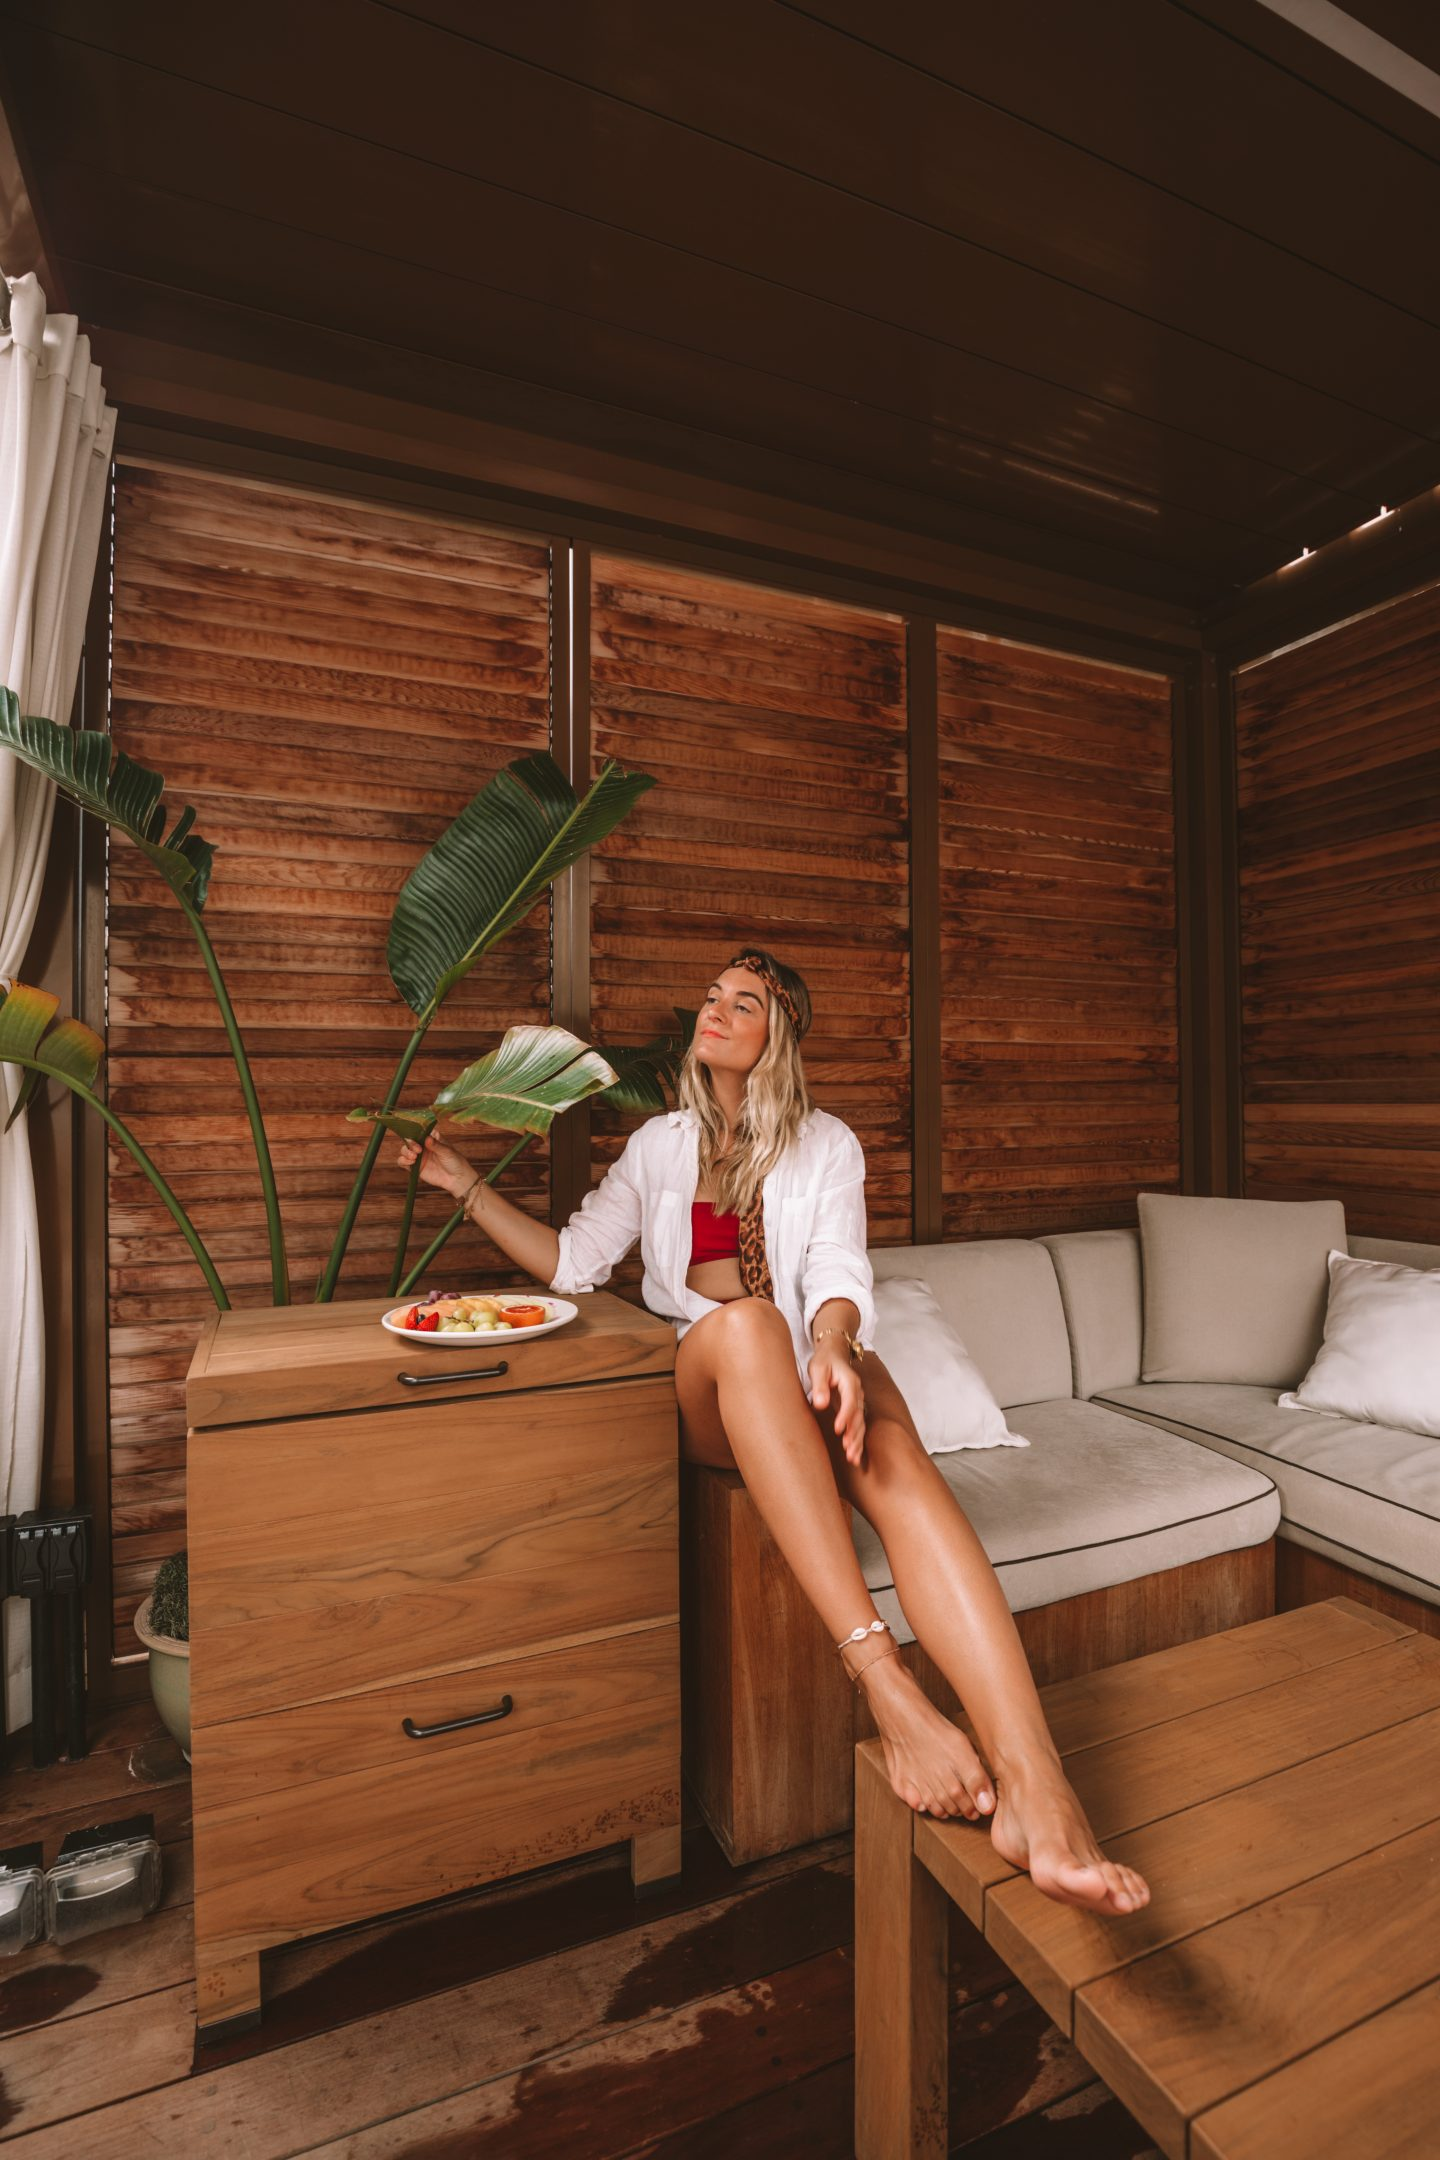 Alohilani hotel Waikiki Beach - Blondie Baby blog mode et voyages